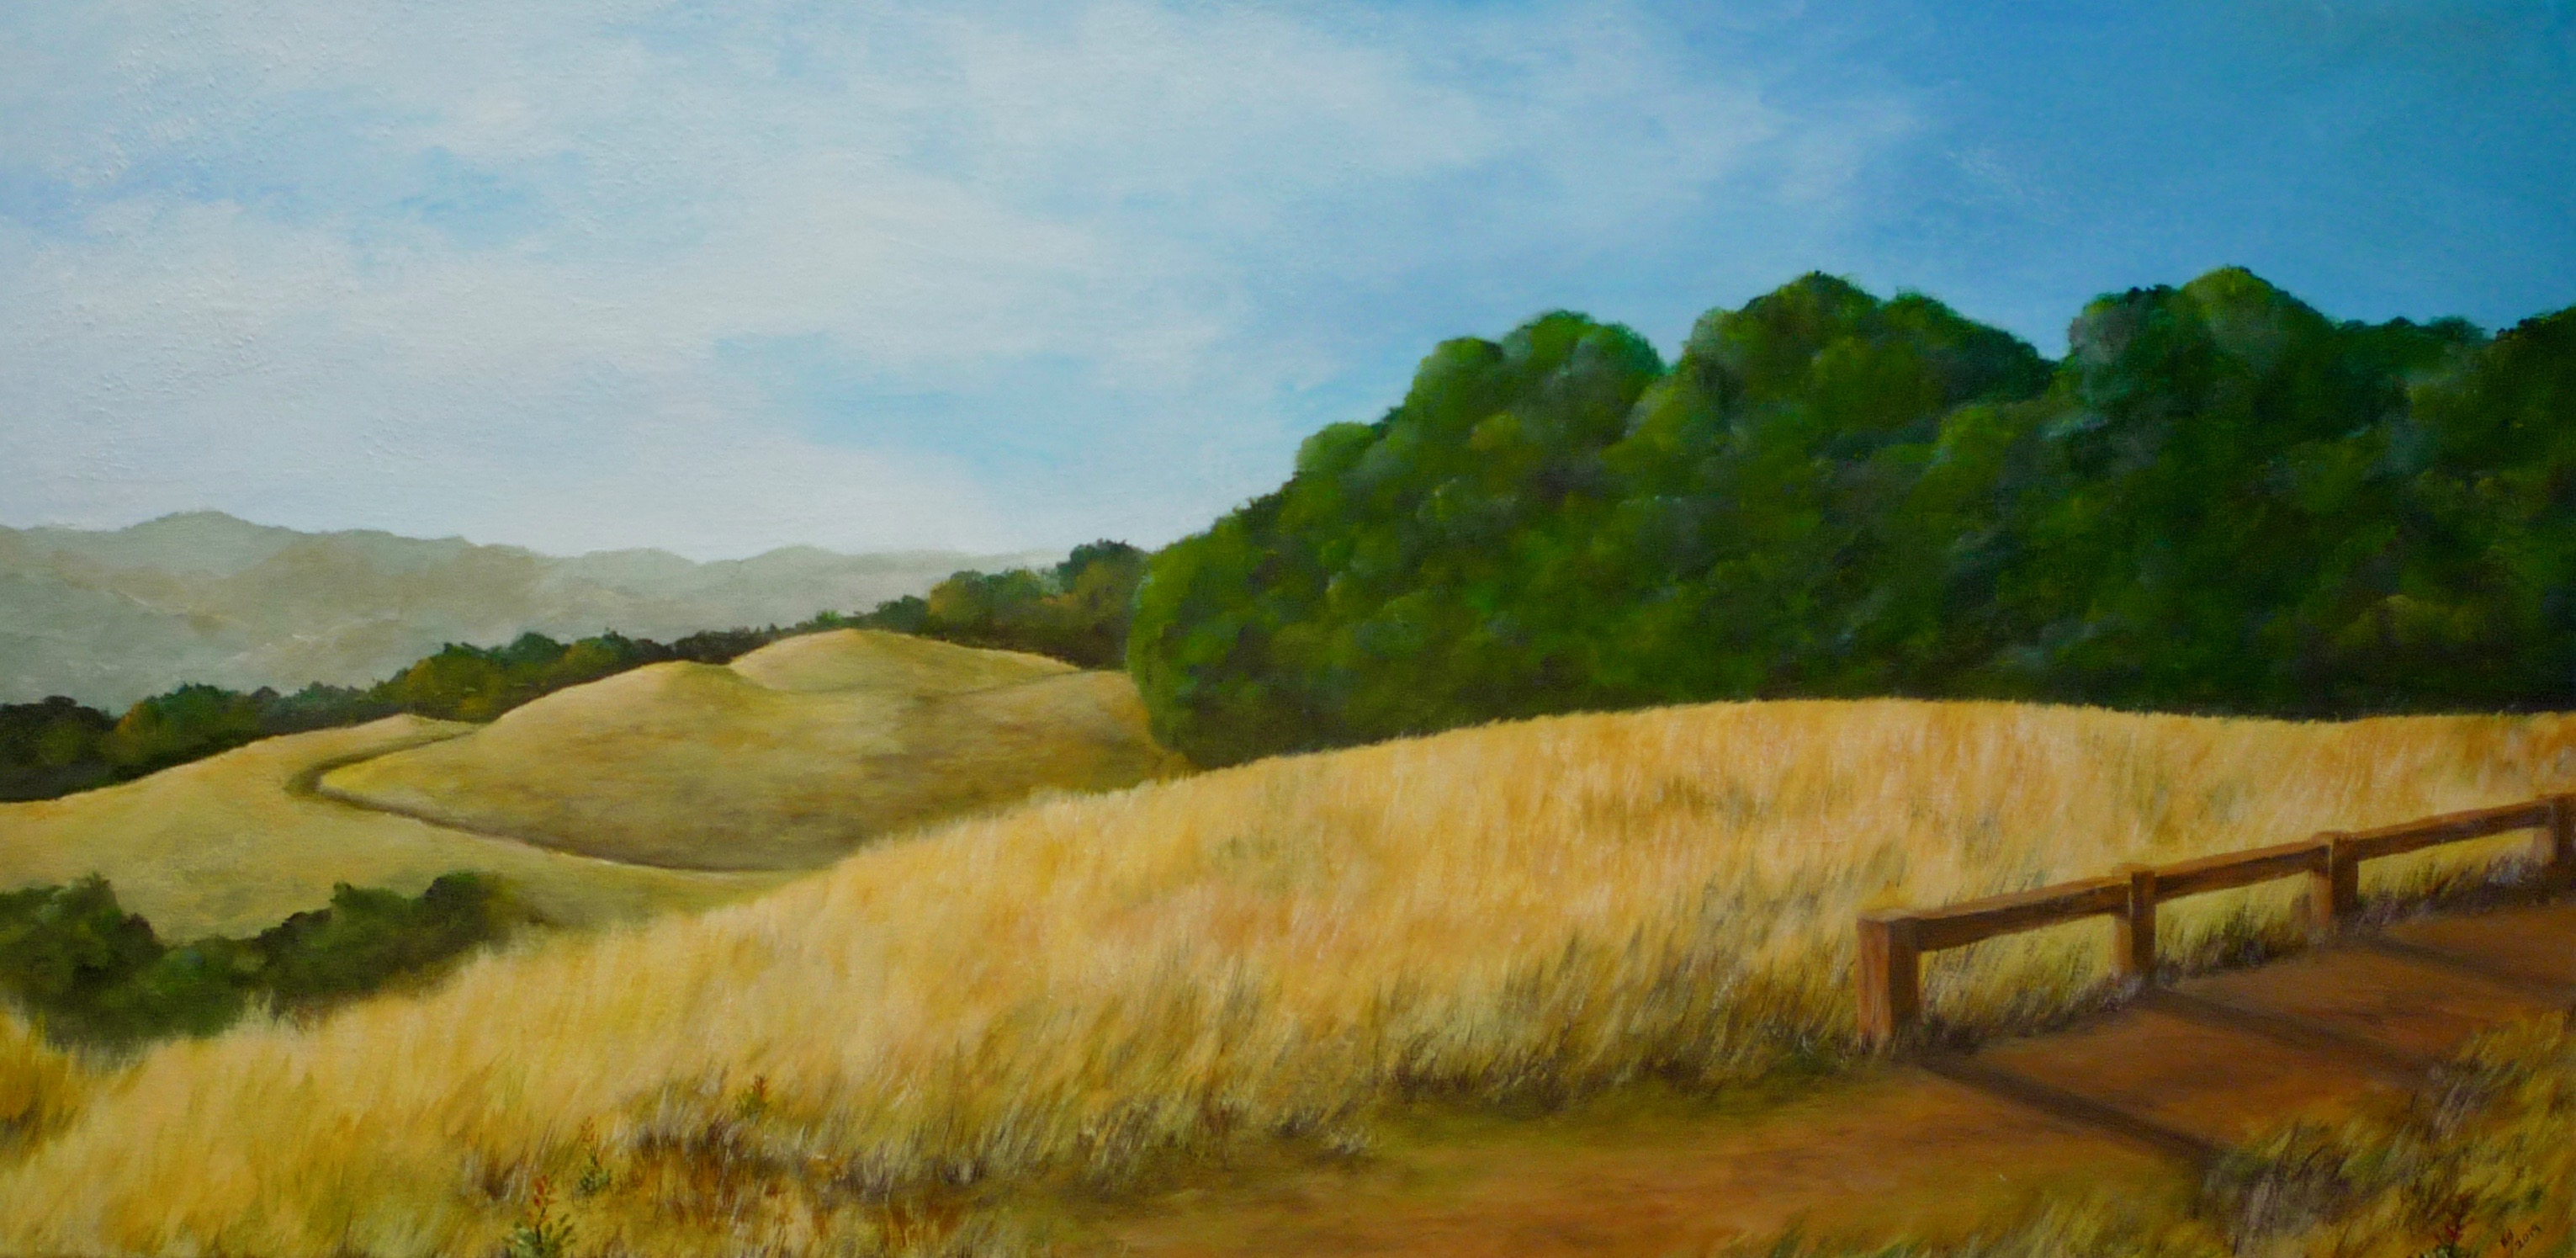 Hill Top Meadow